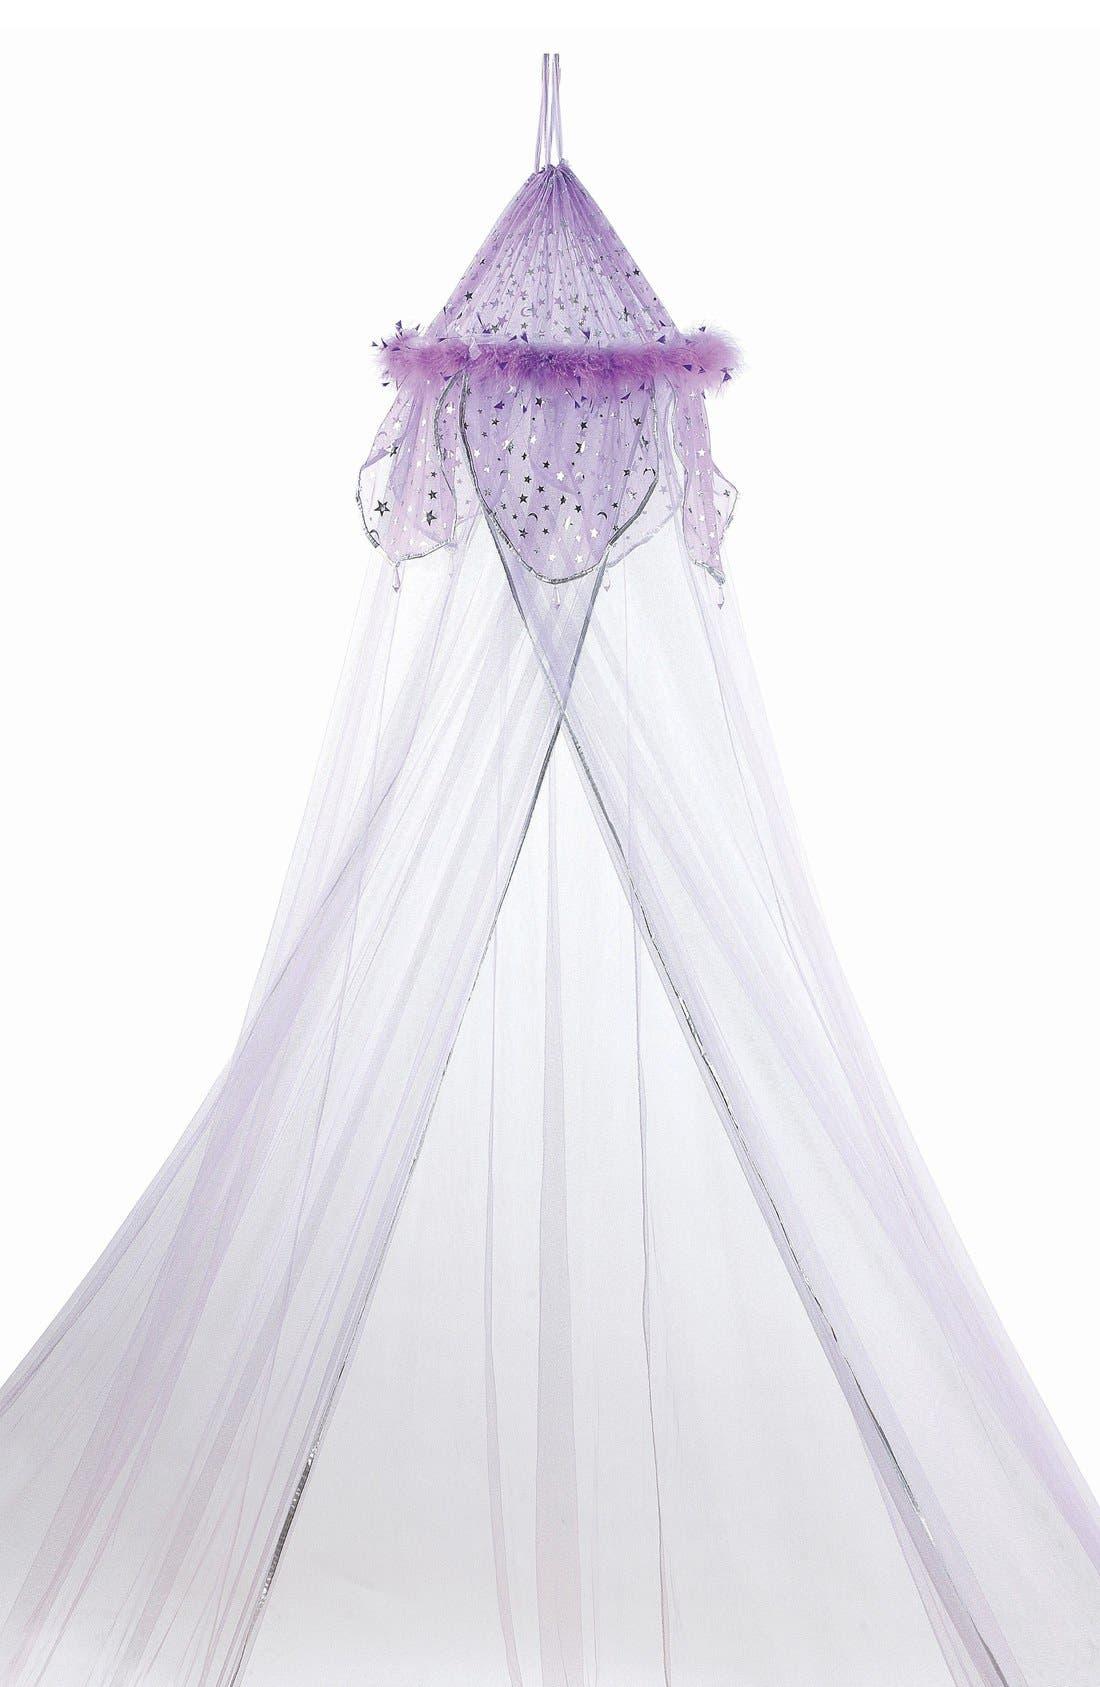 'Lavender Fantasy' Bed Canopy,                             Main thumbnail 1, color,                             500